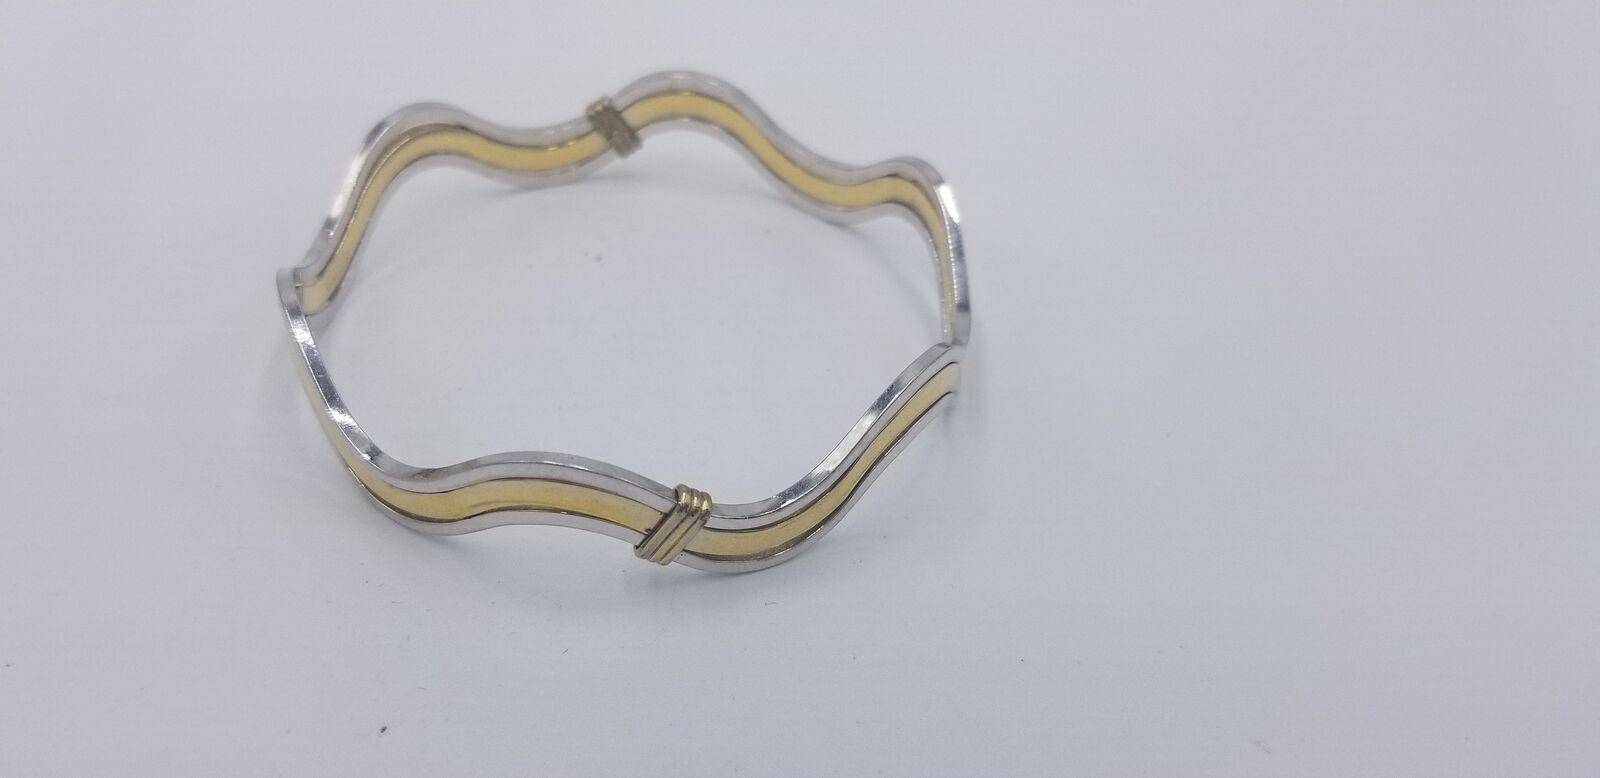 Vintage Signed Avon Silver And Gold Tone Wavy Style No Clasp Bracelet EUC image 3